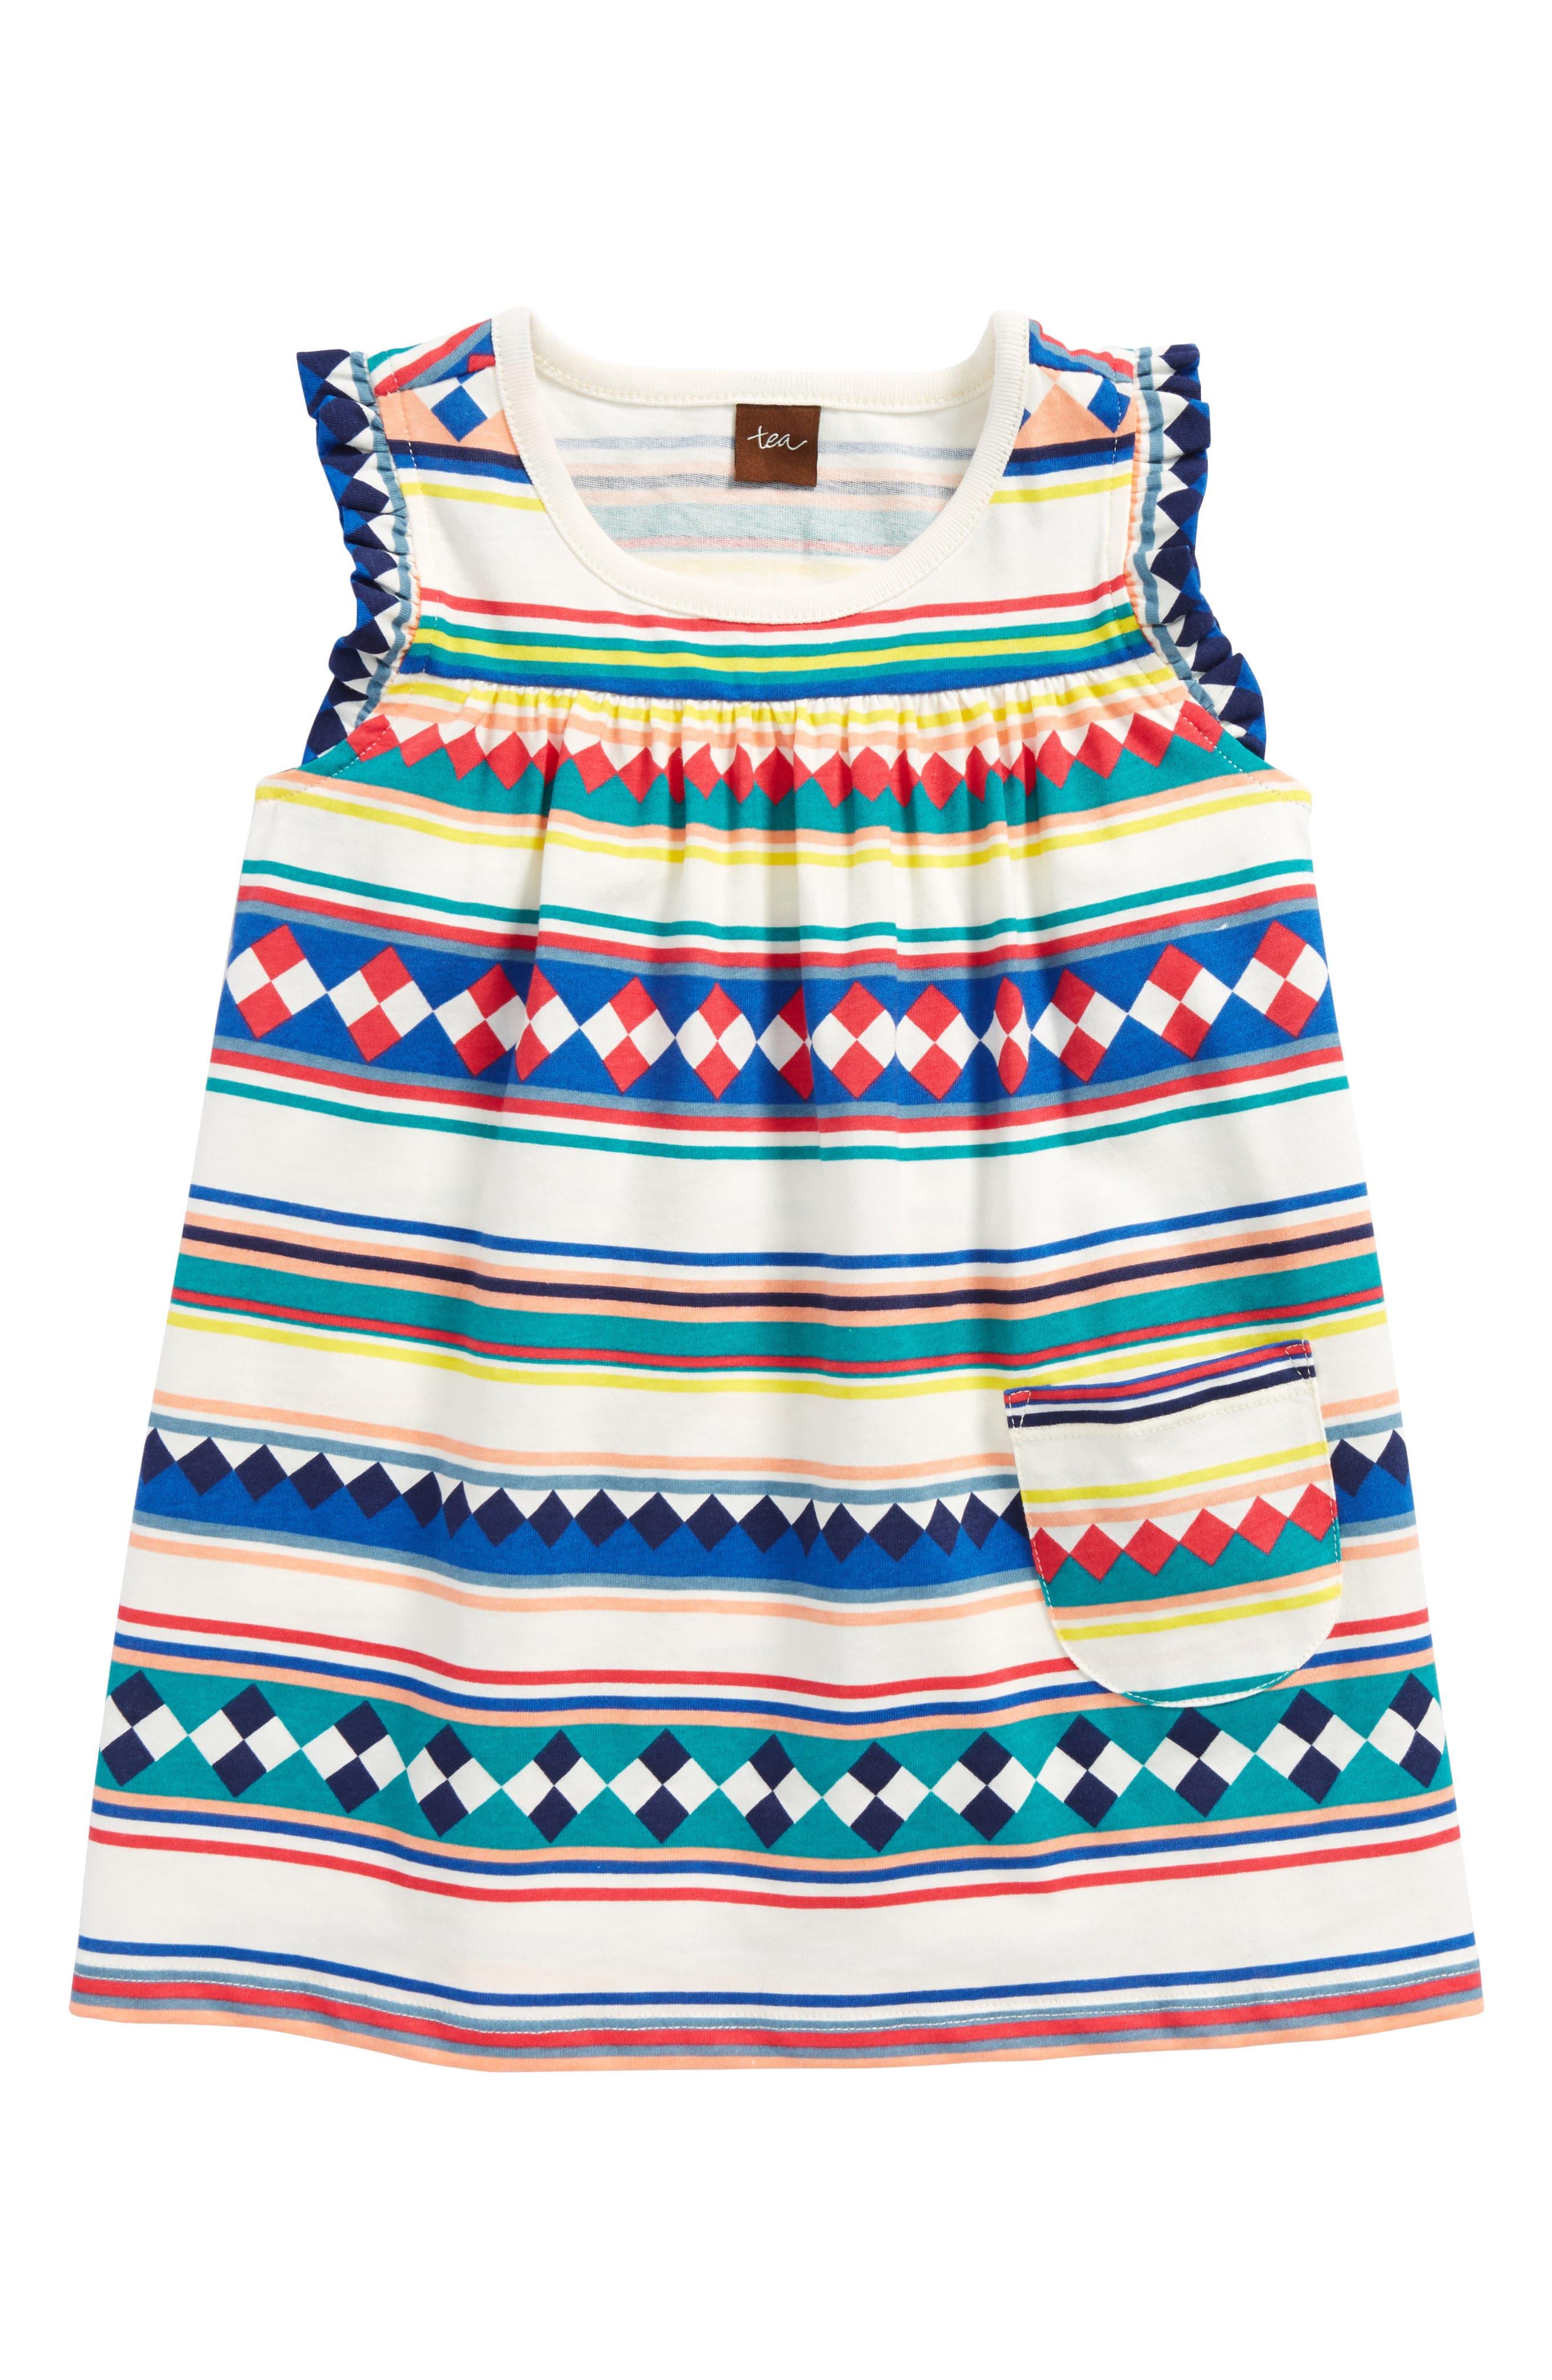 Mighty Mini Dress,                         Main,                         color, Seminole Patchwork Stripe